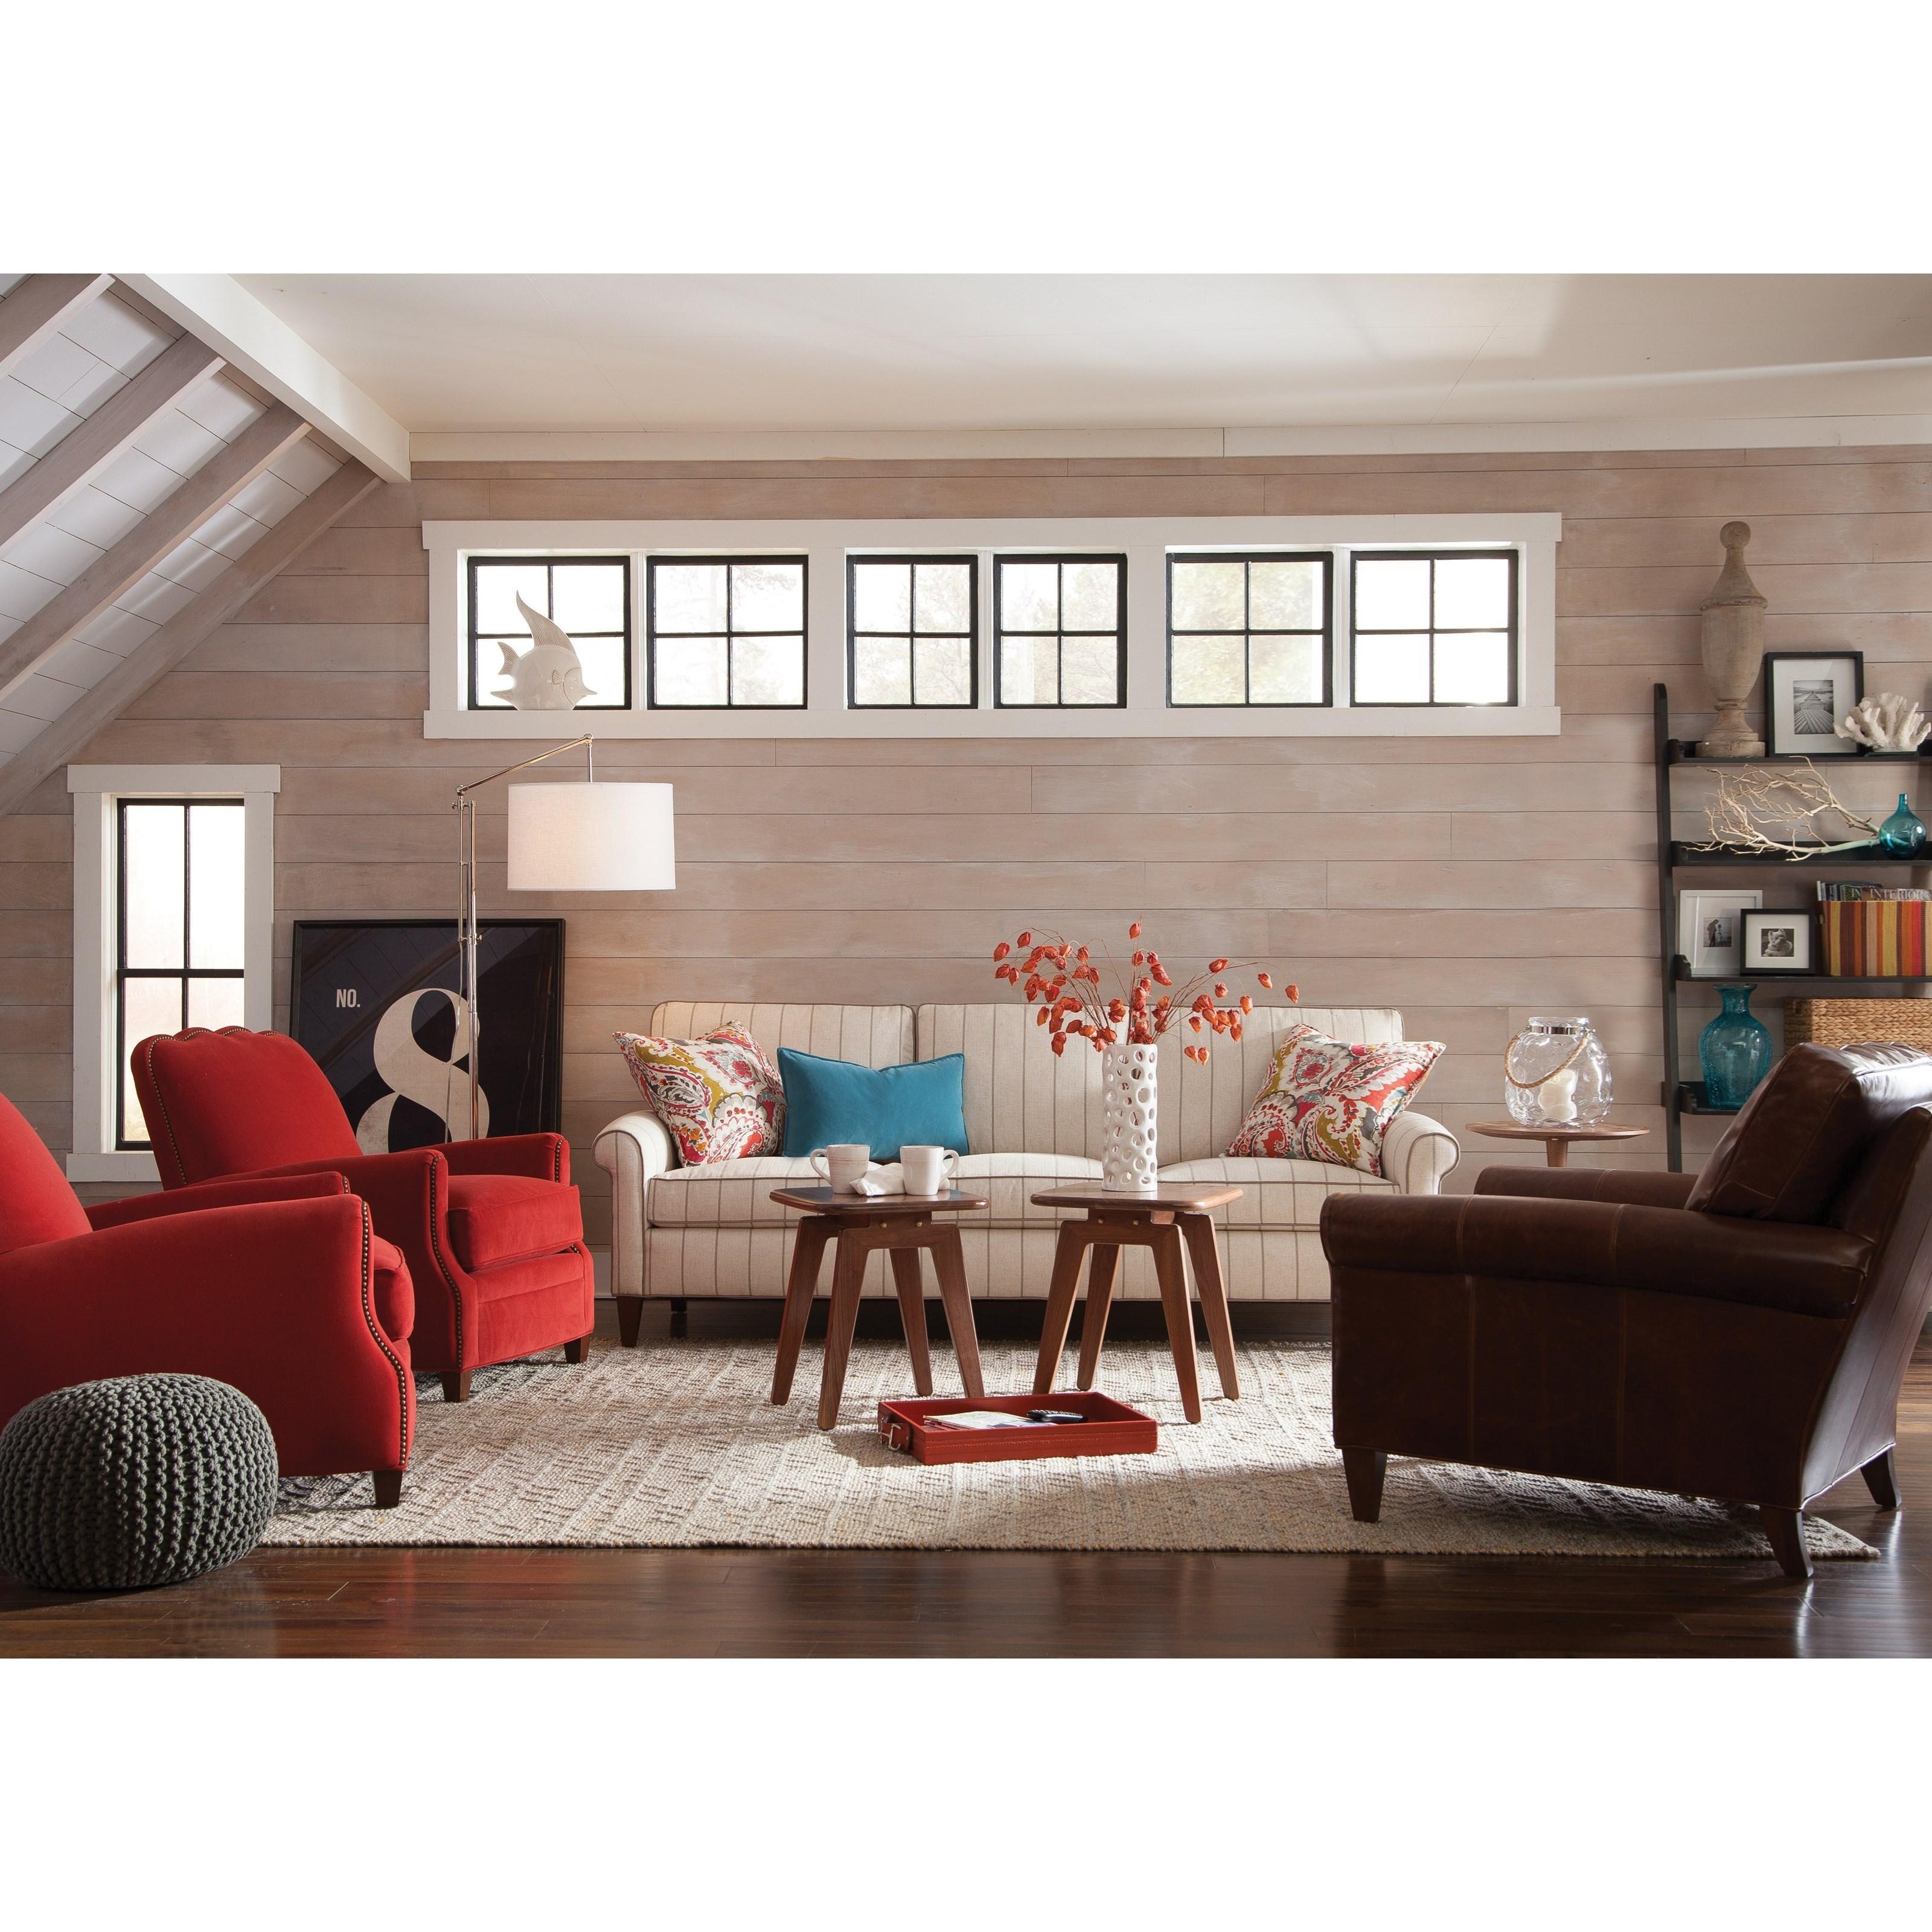 Harper Living Room Group by Huntington House at Belfort Furniture